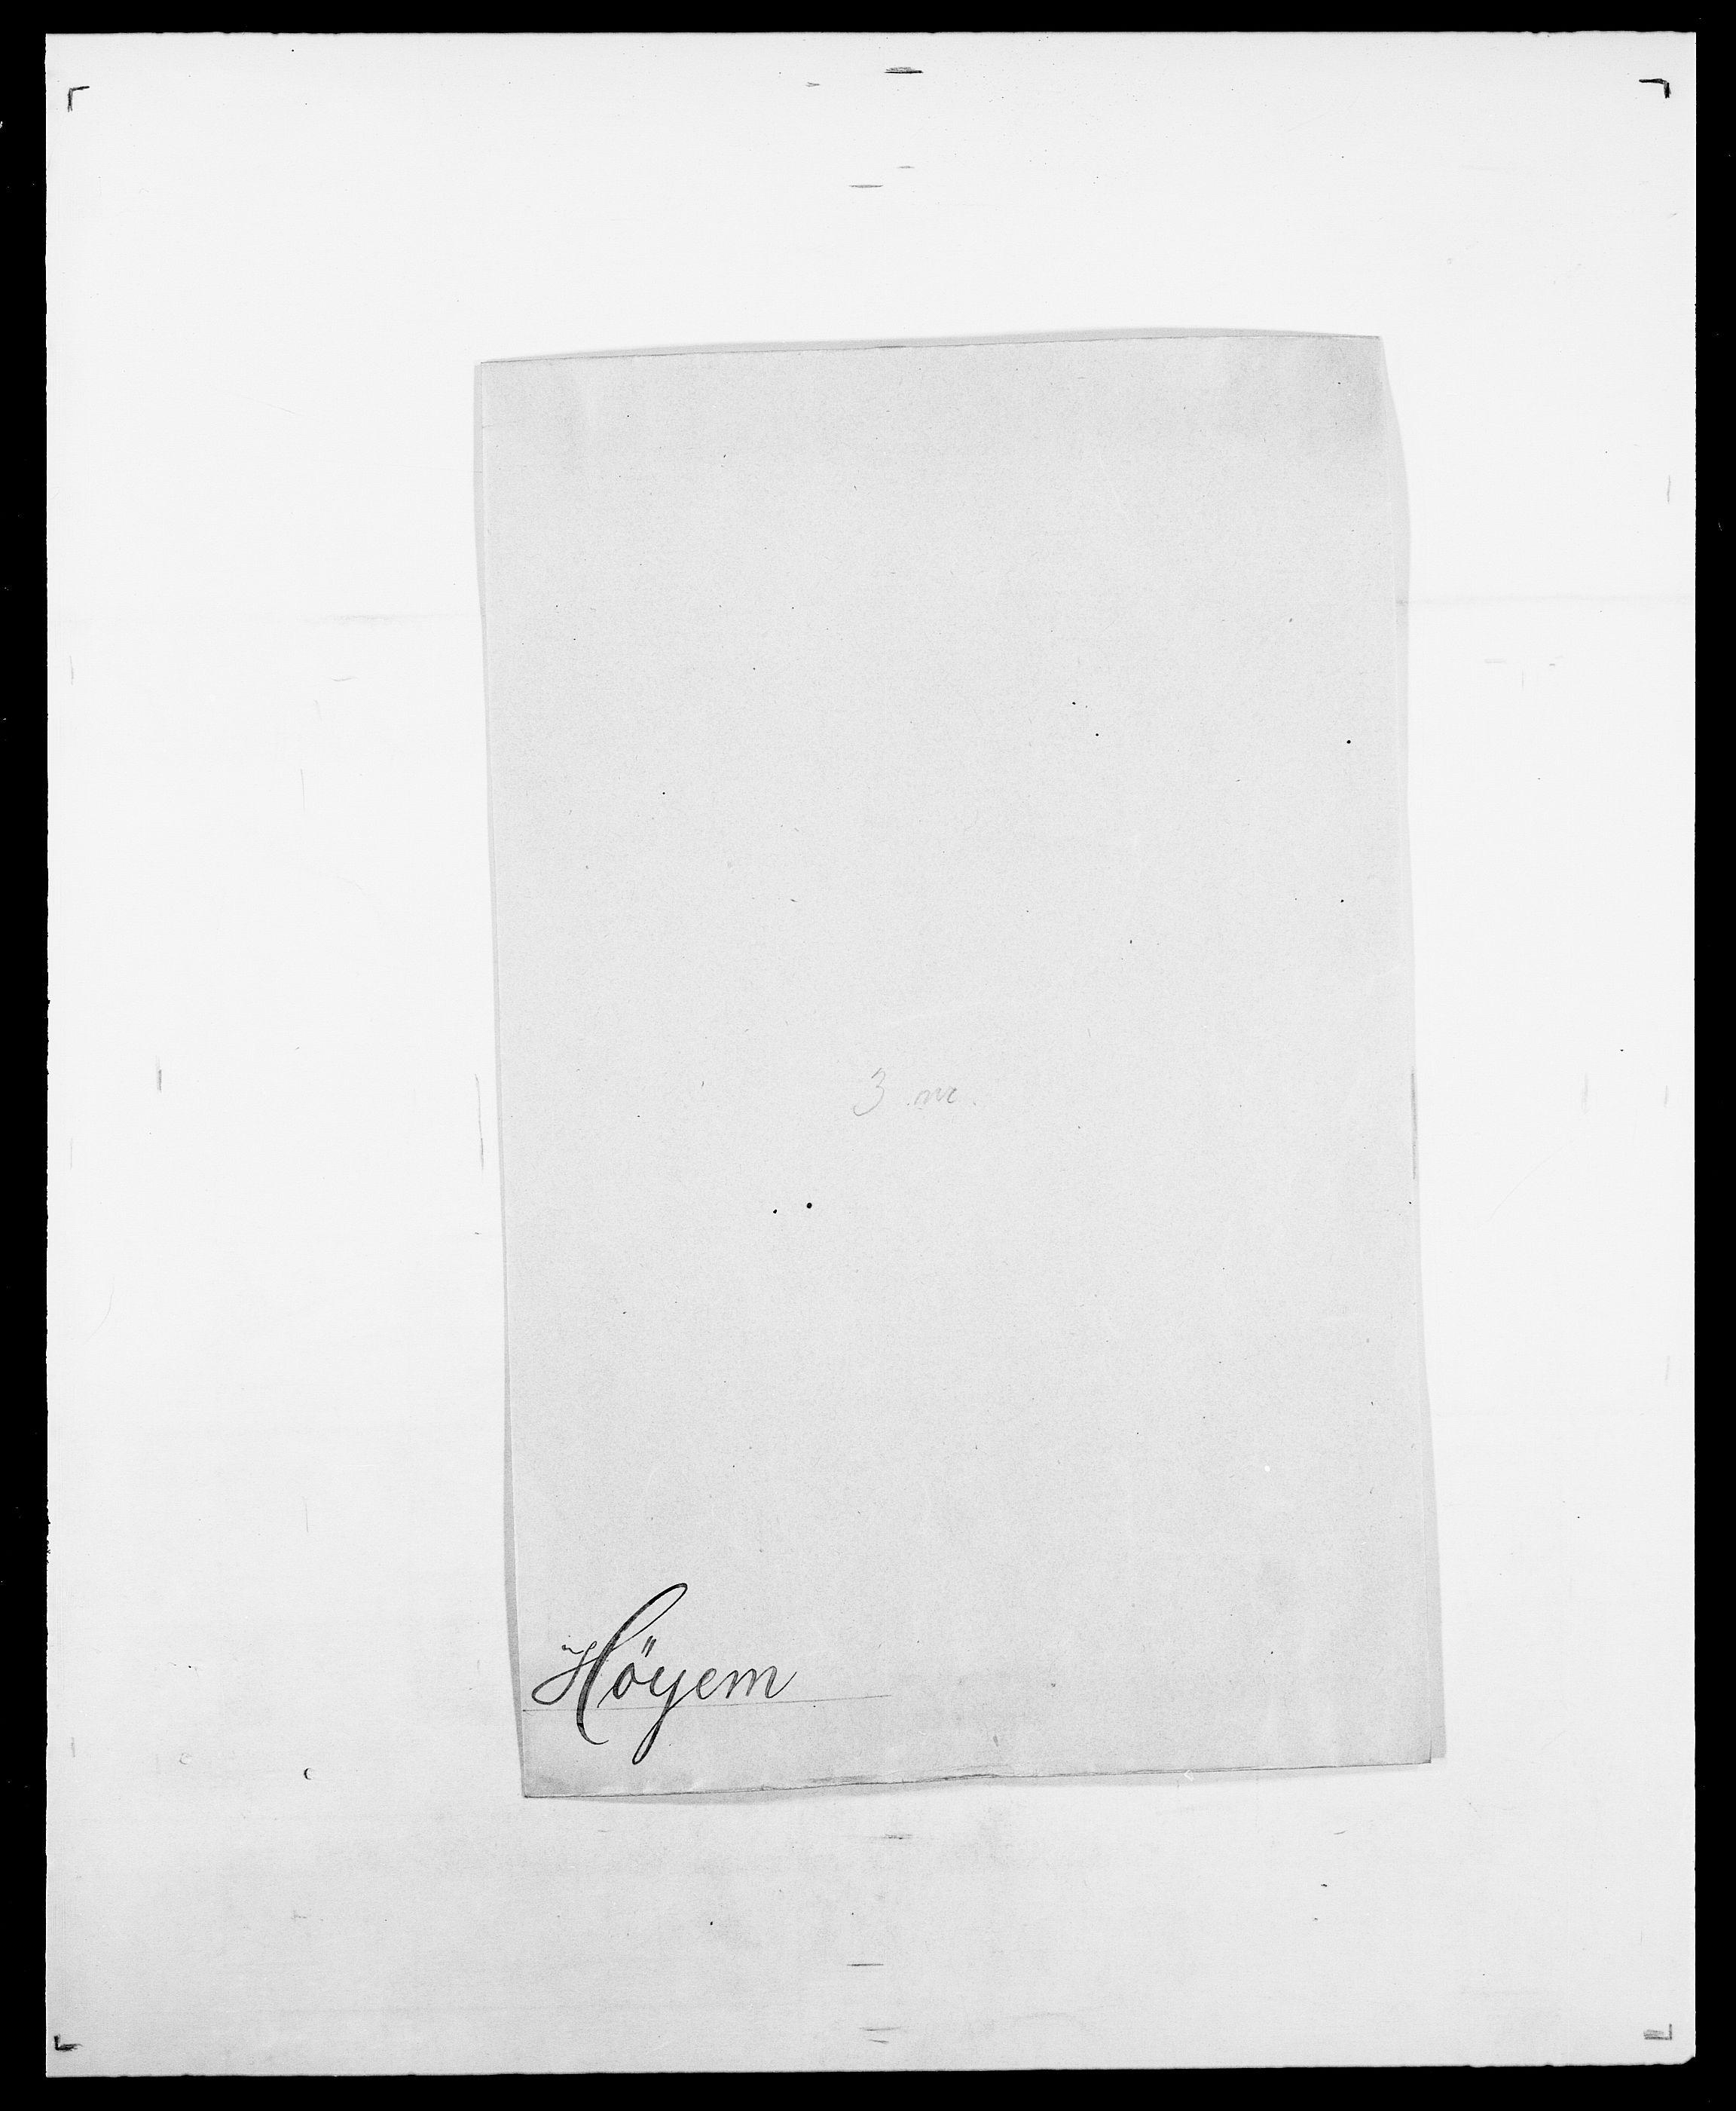 SAO, Delgobe, Charles Antoine - samling, D/Da/L0019: van der Hude - Joys, s. 410